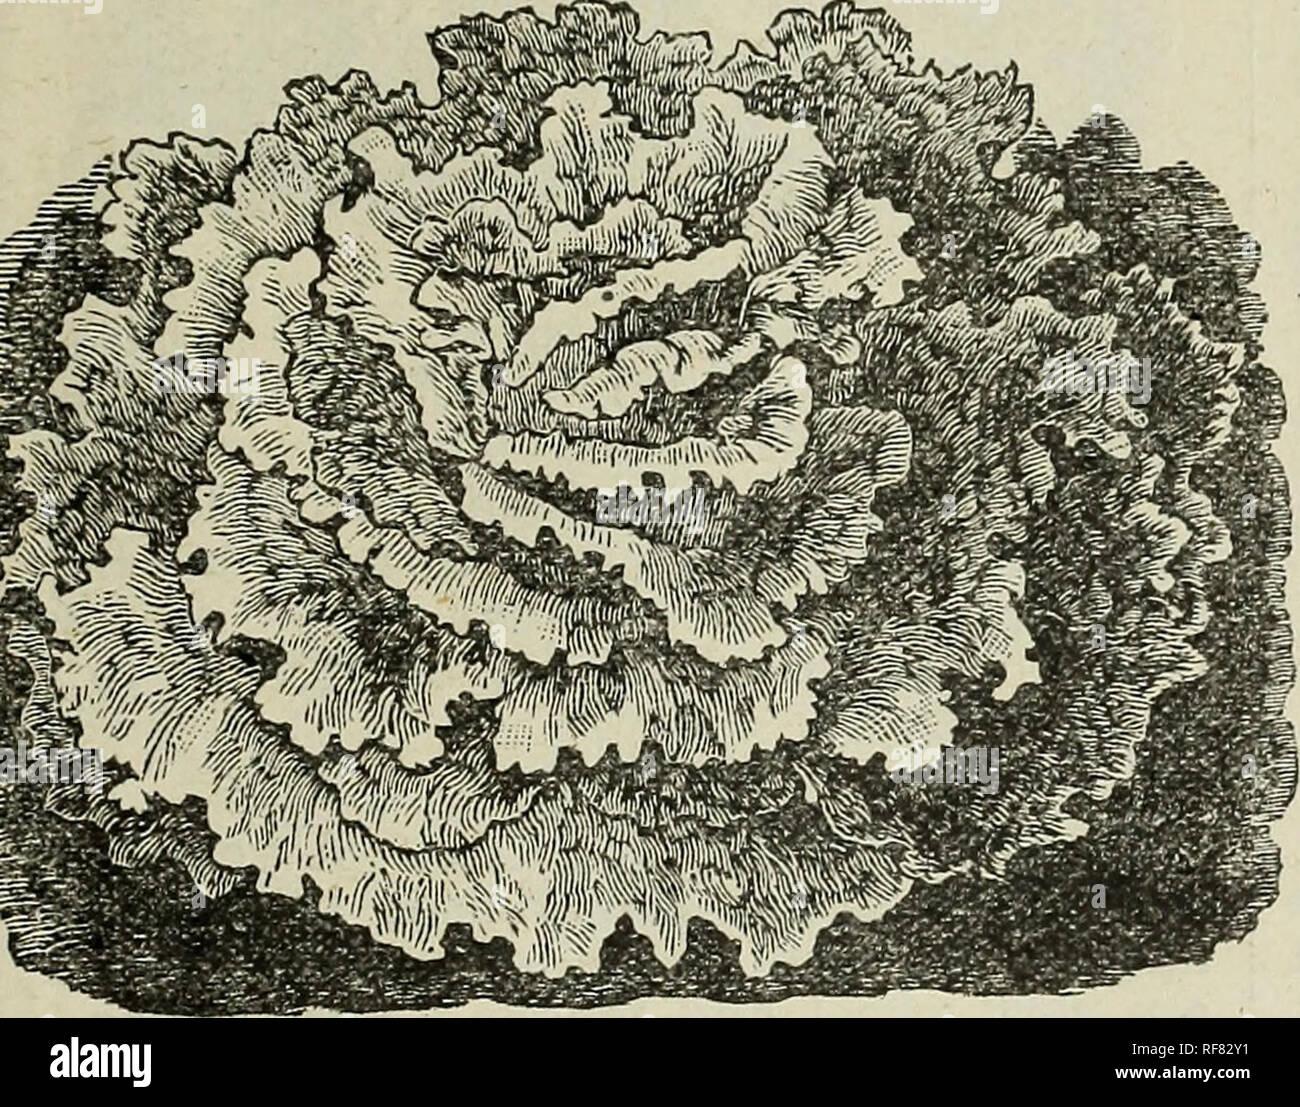 Vegetable, field and flower seeds : descriptive catalogue